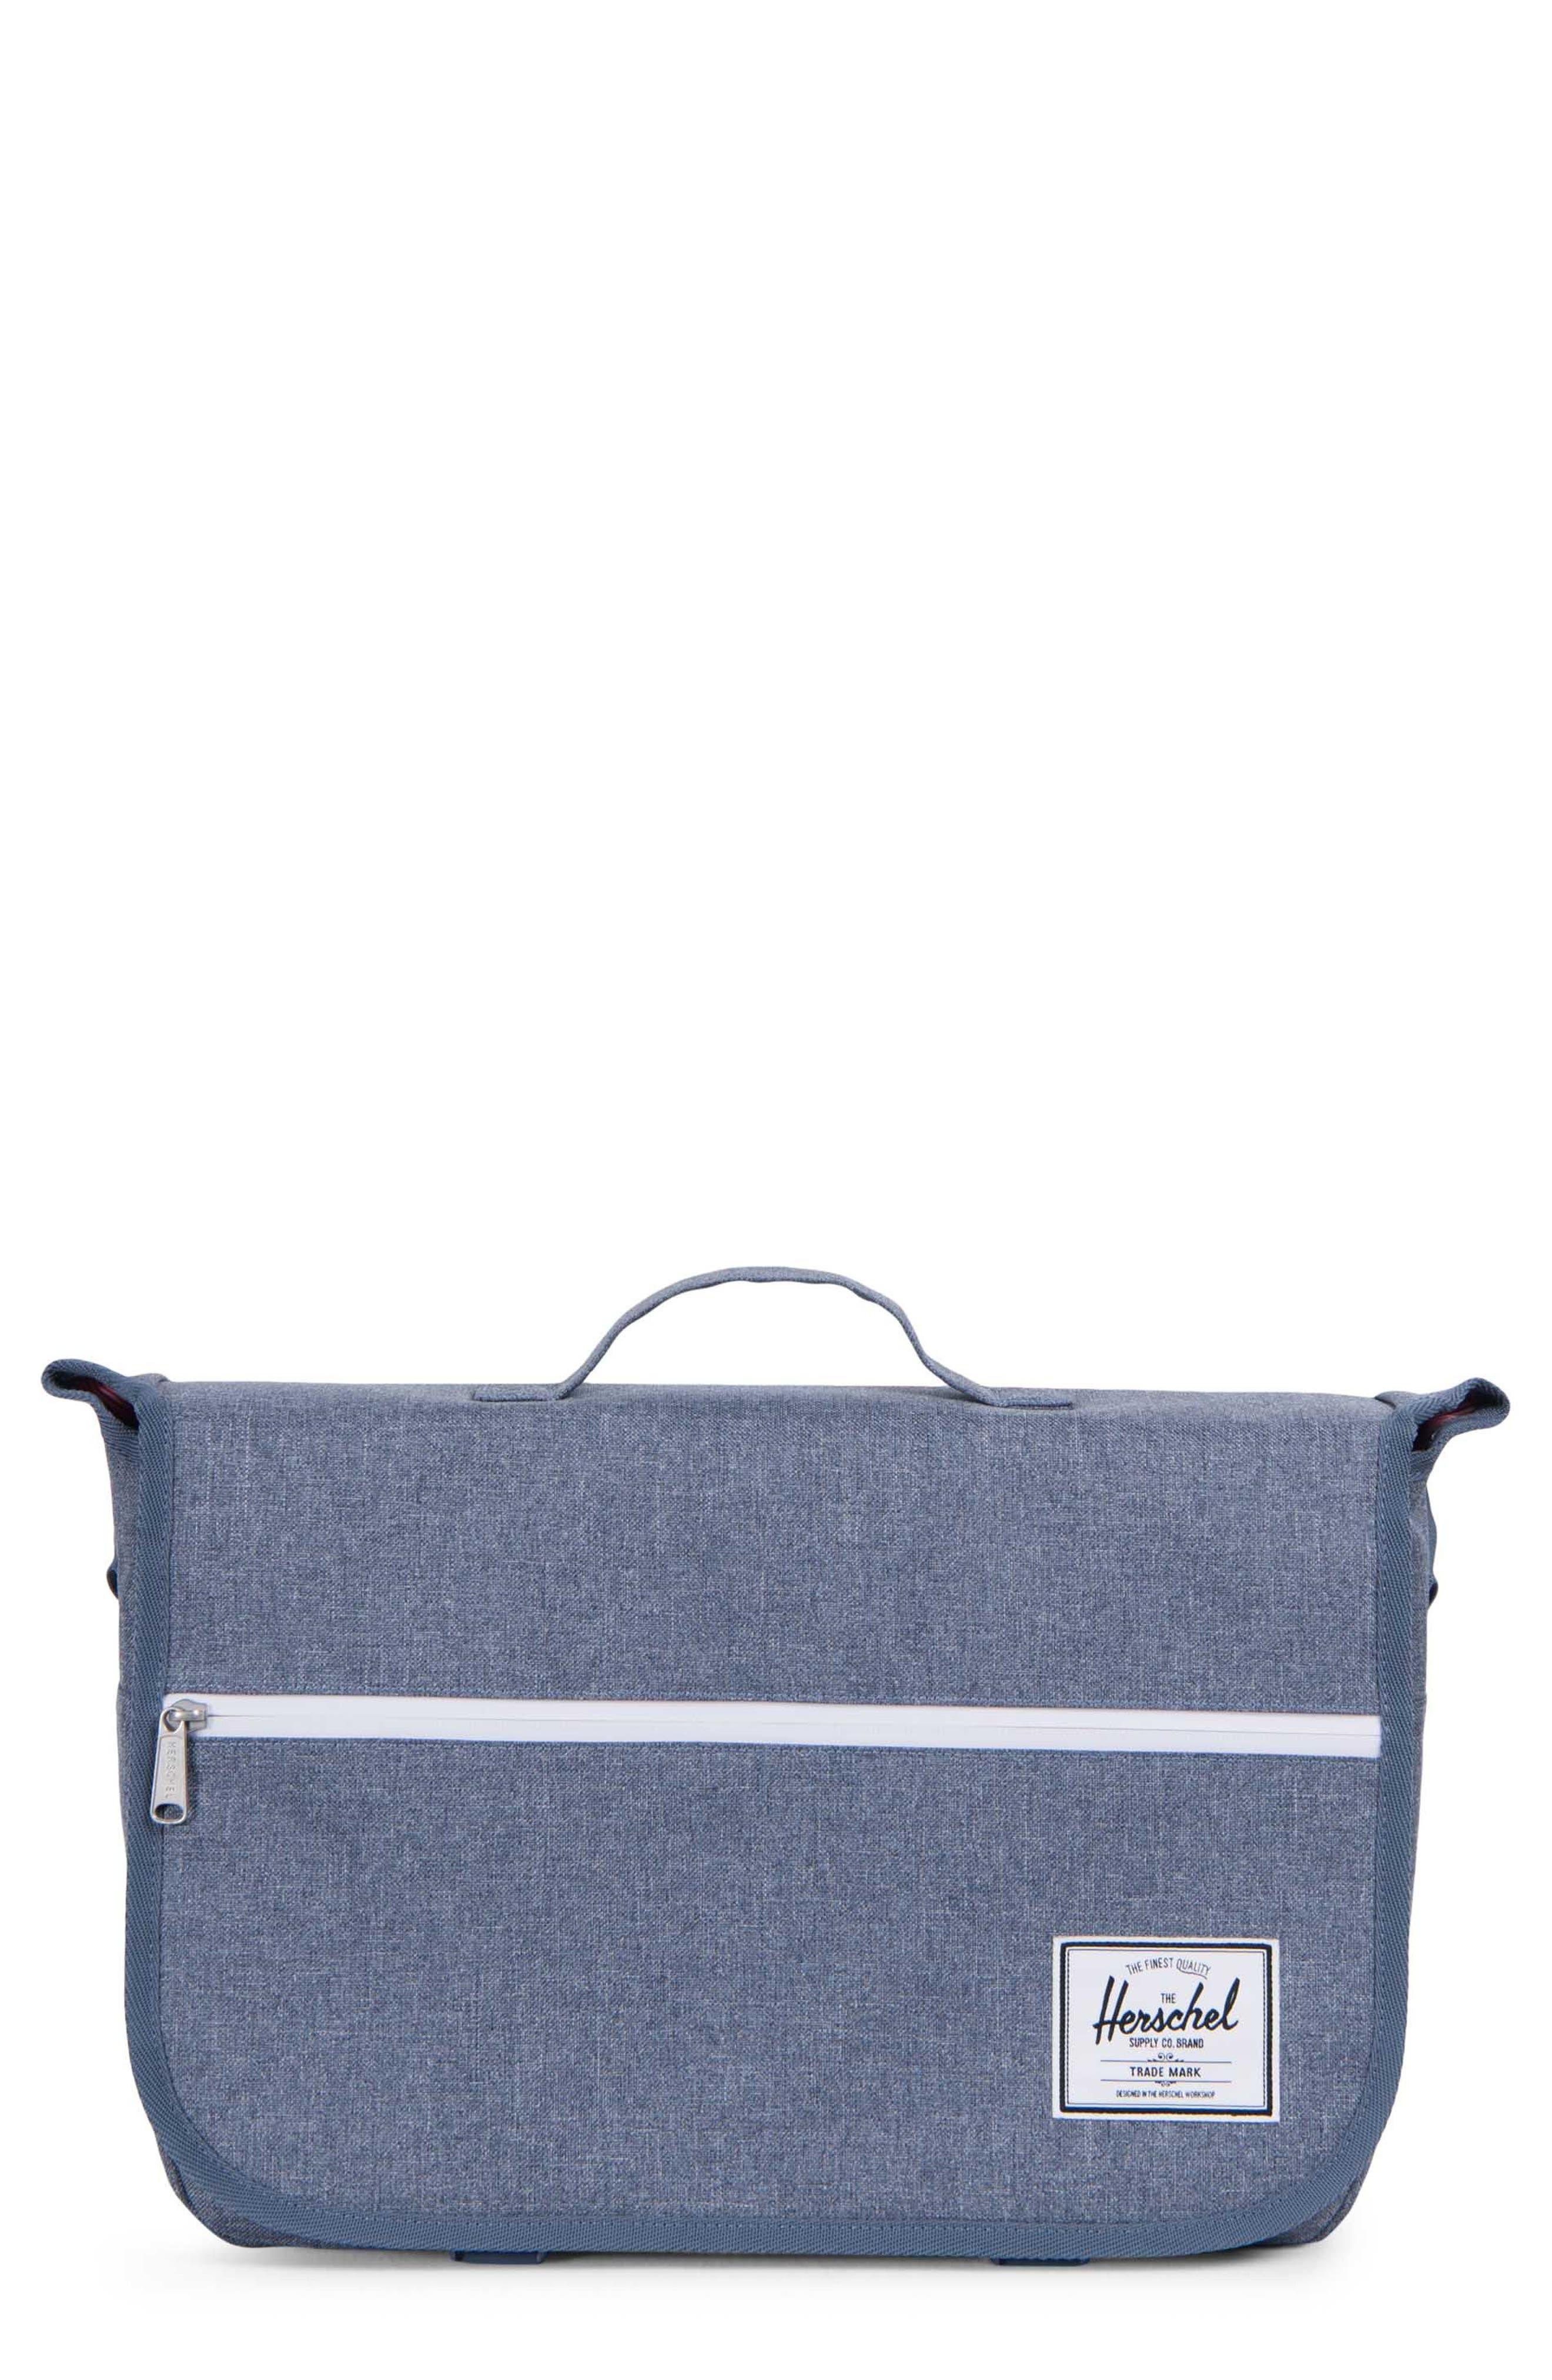 Alternate Image 1 Selected - Herschel Supply Co. 'Pop Quiz' Messenger Bag